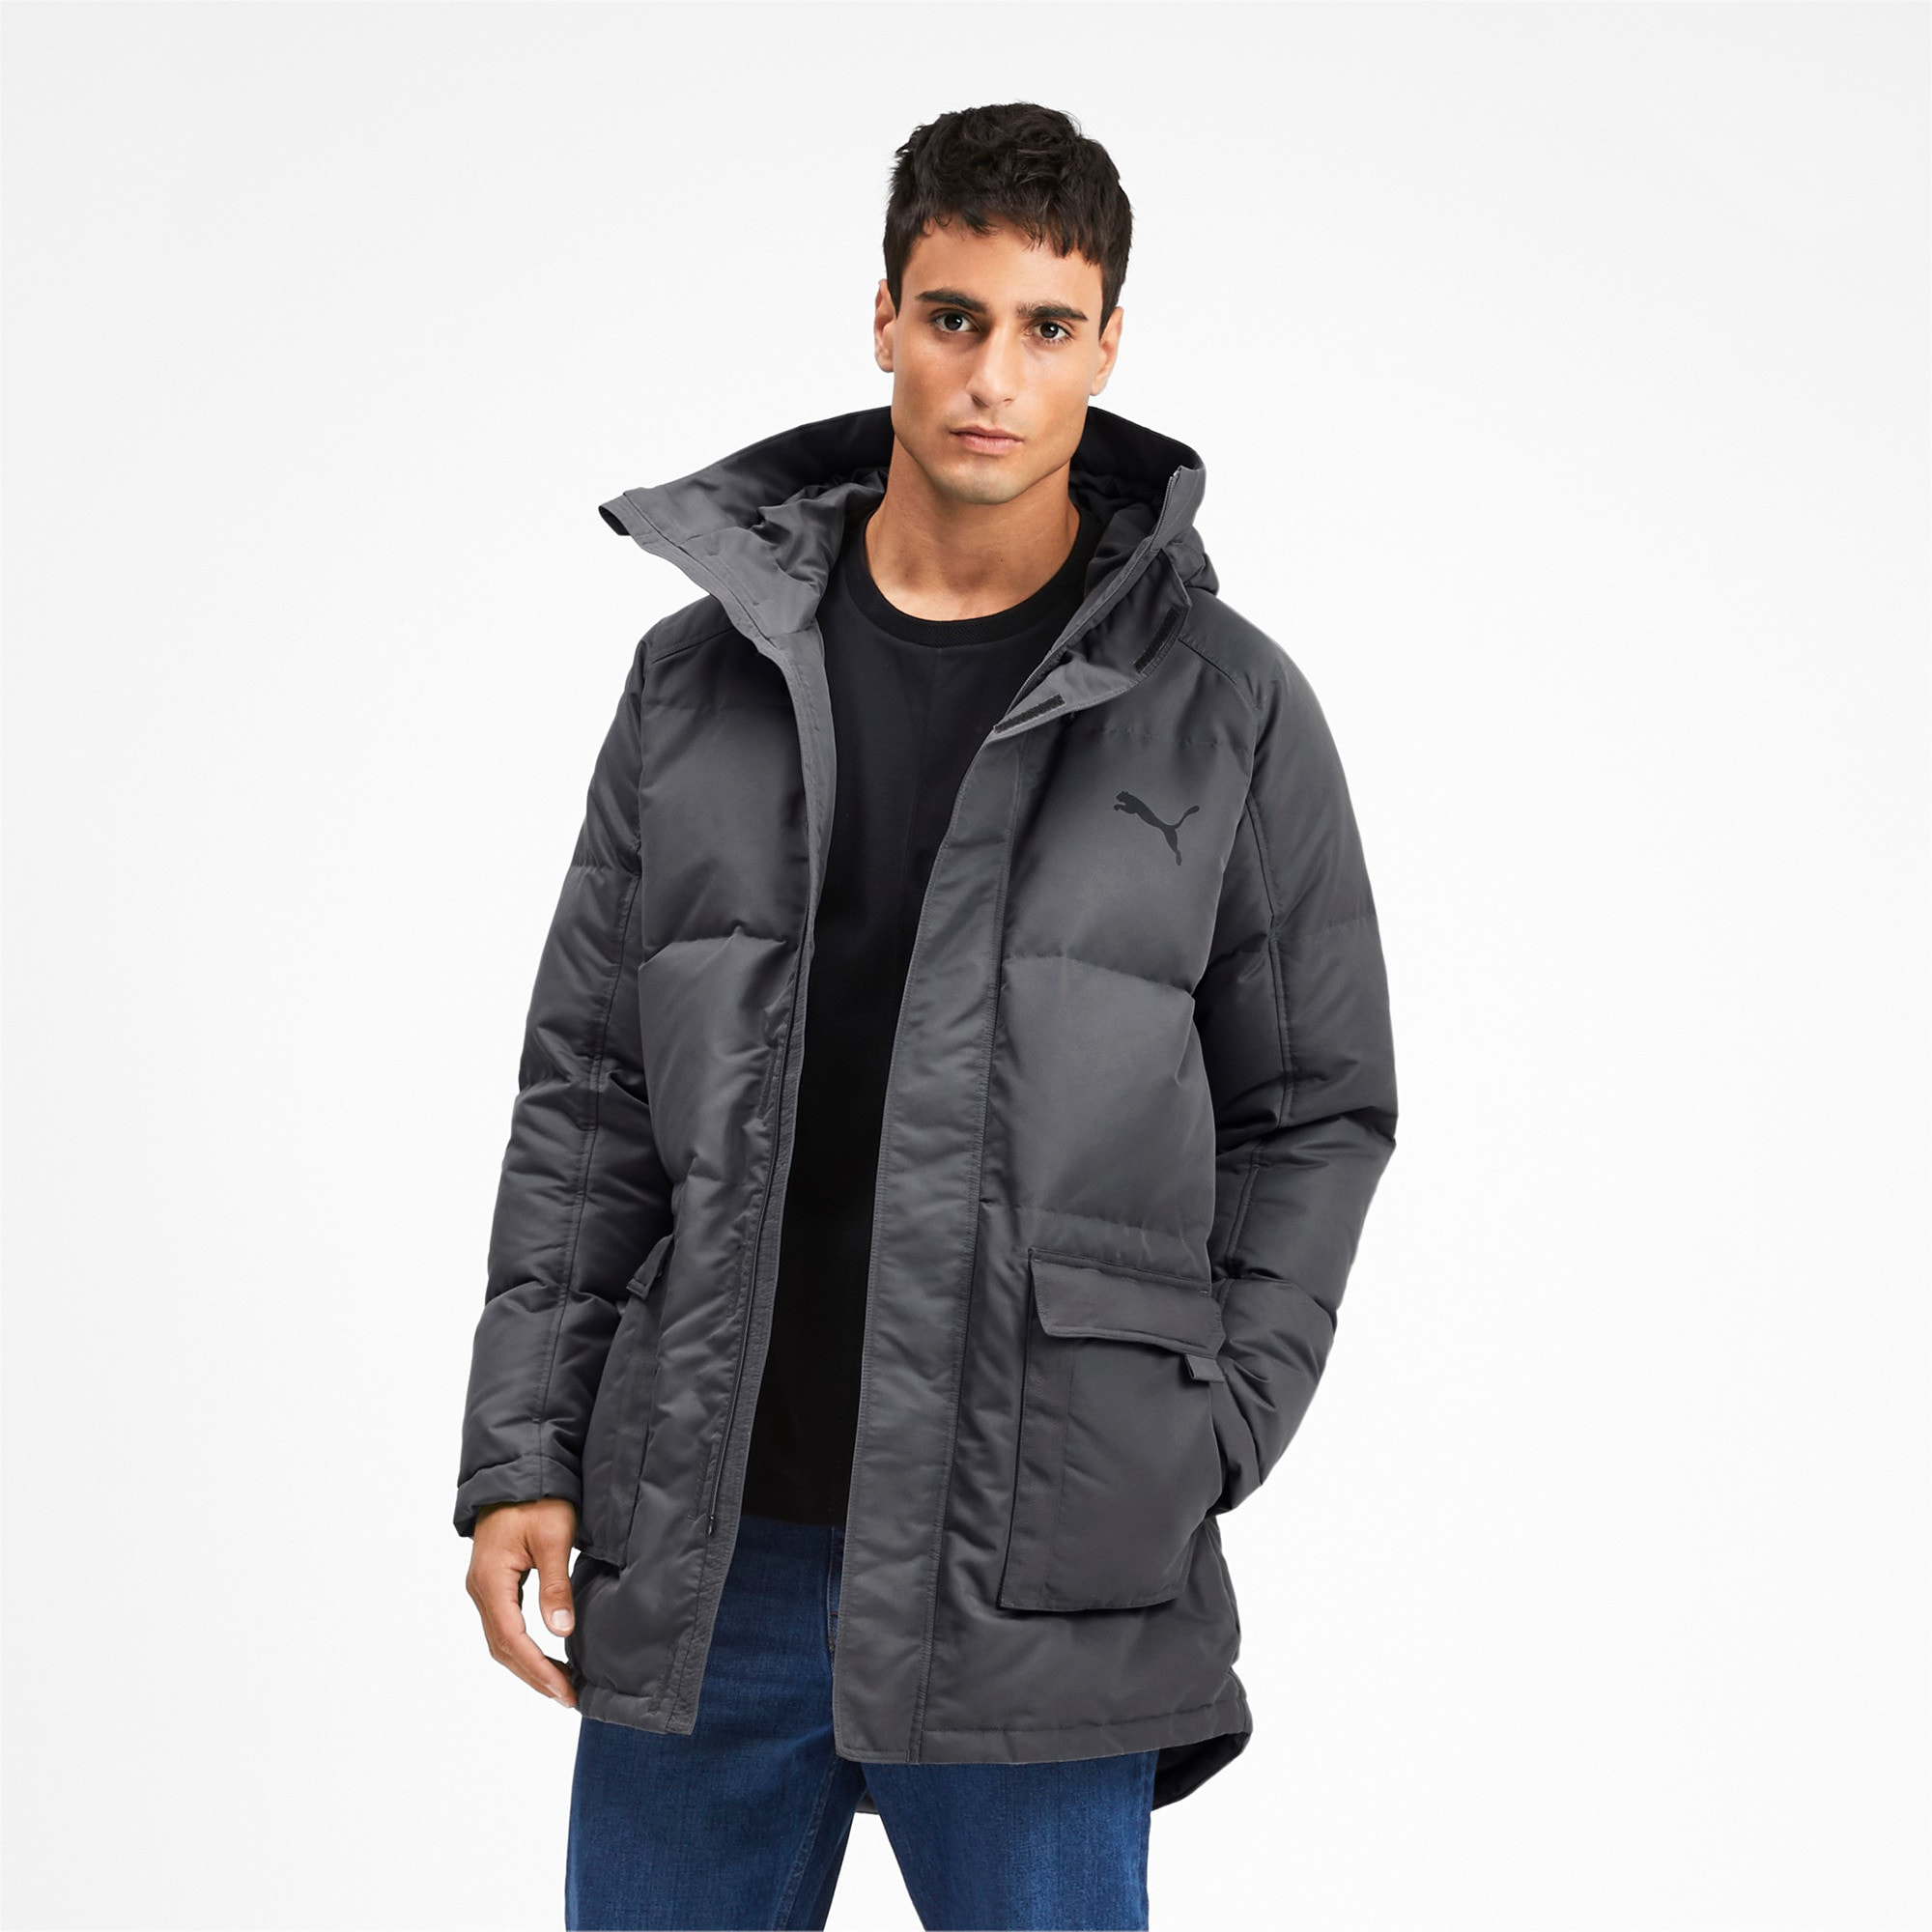 Thumbnail 1 of Oversize 500 Down Hooded Men's Jacket, CASTLEROCK, medium